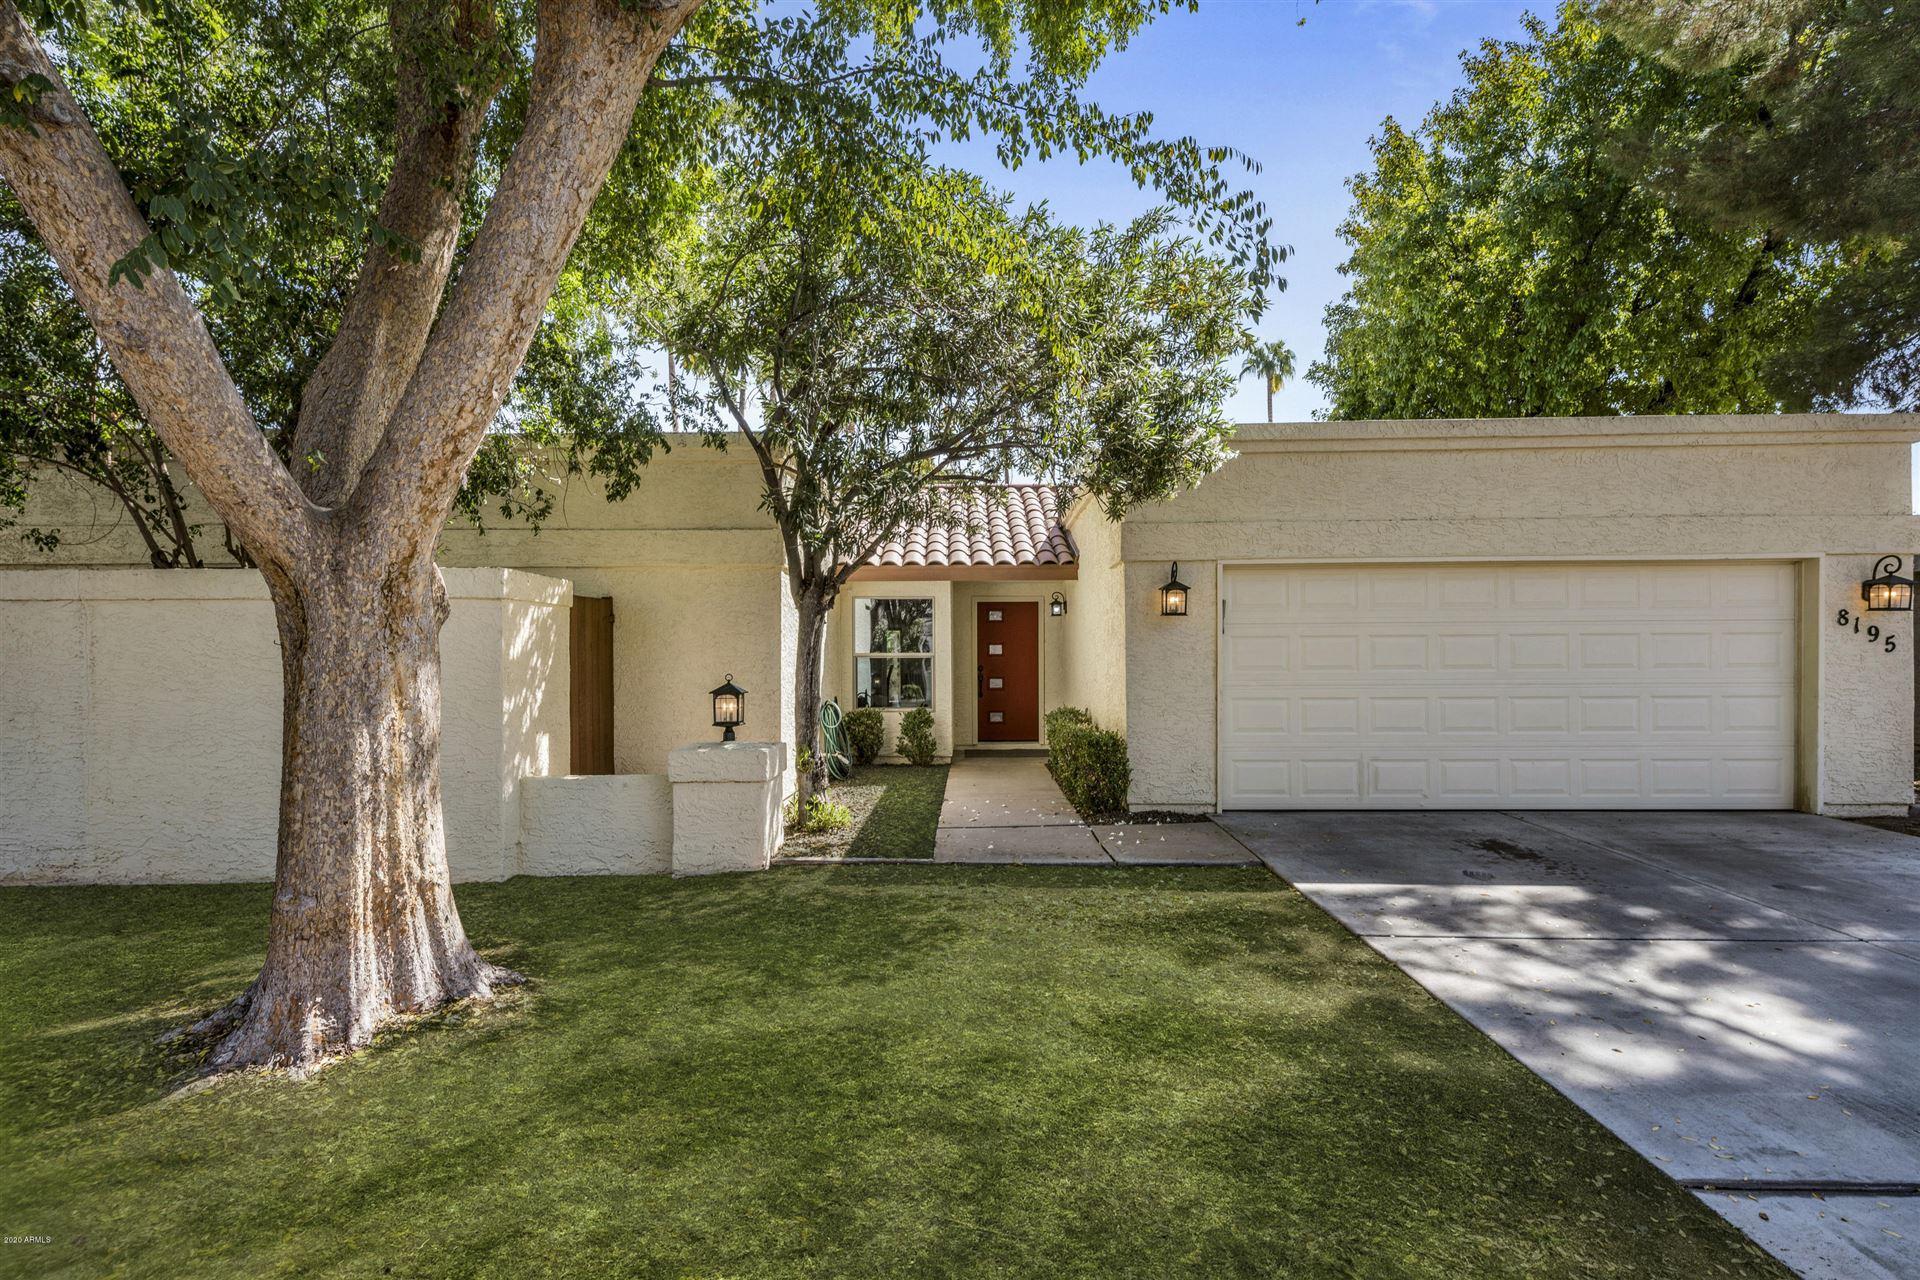 8195 E DEL CAVERNA Drive, Scottsdale, AZ 85258 - MLS#: 6147972